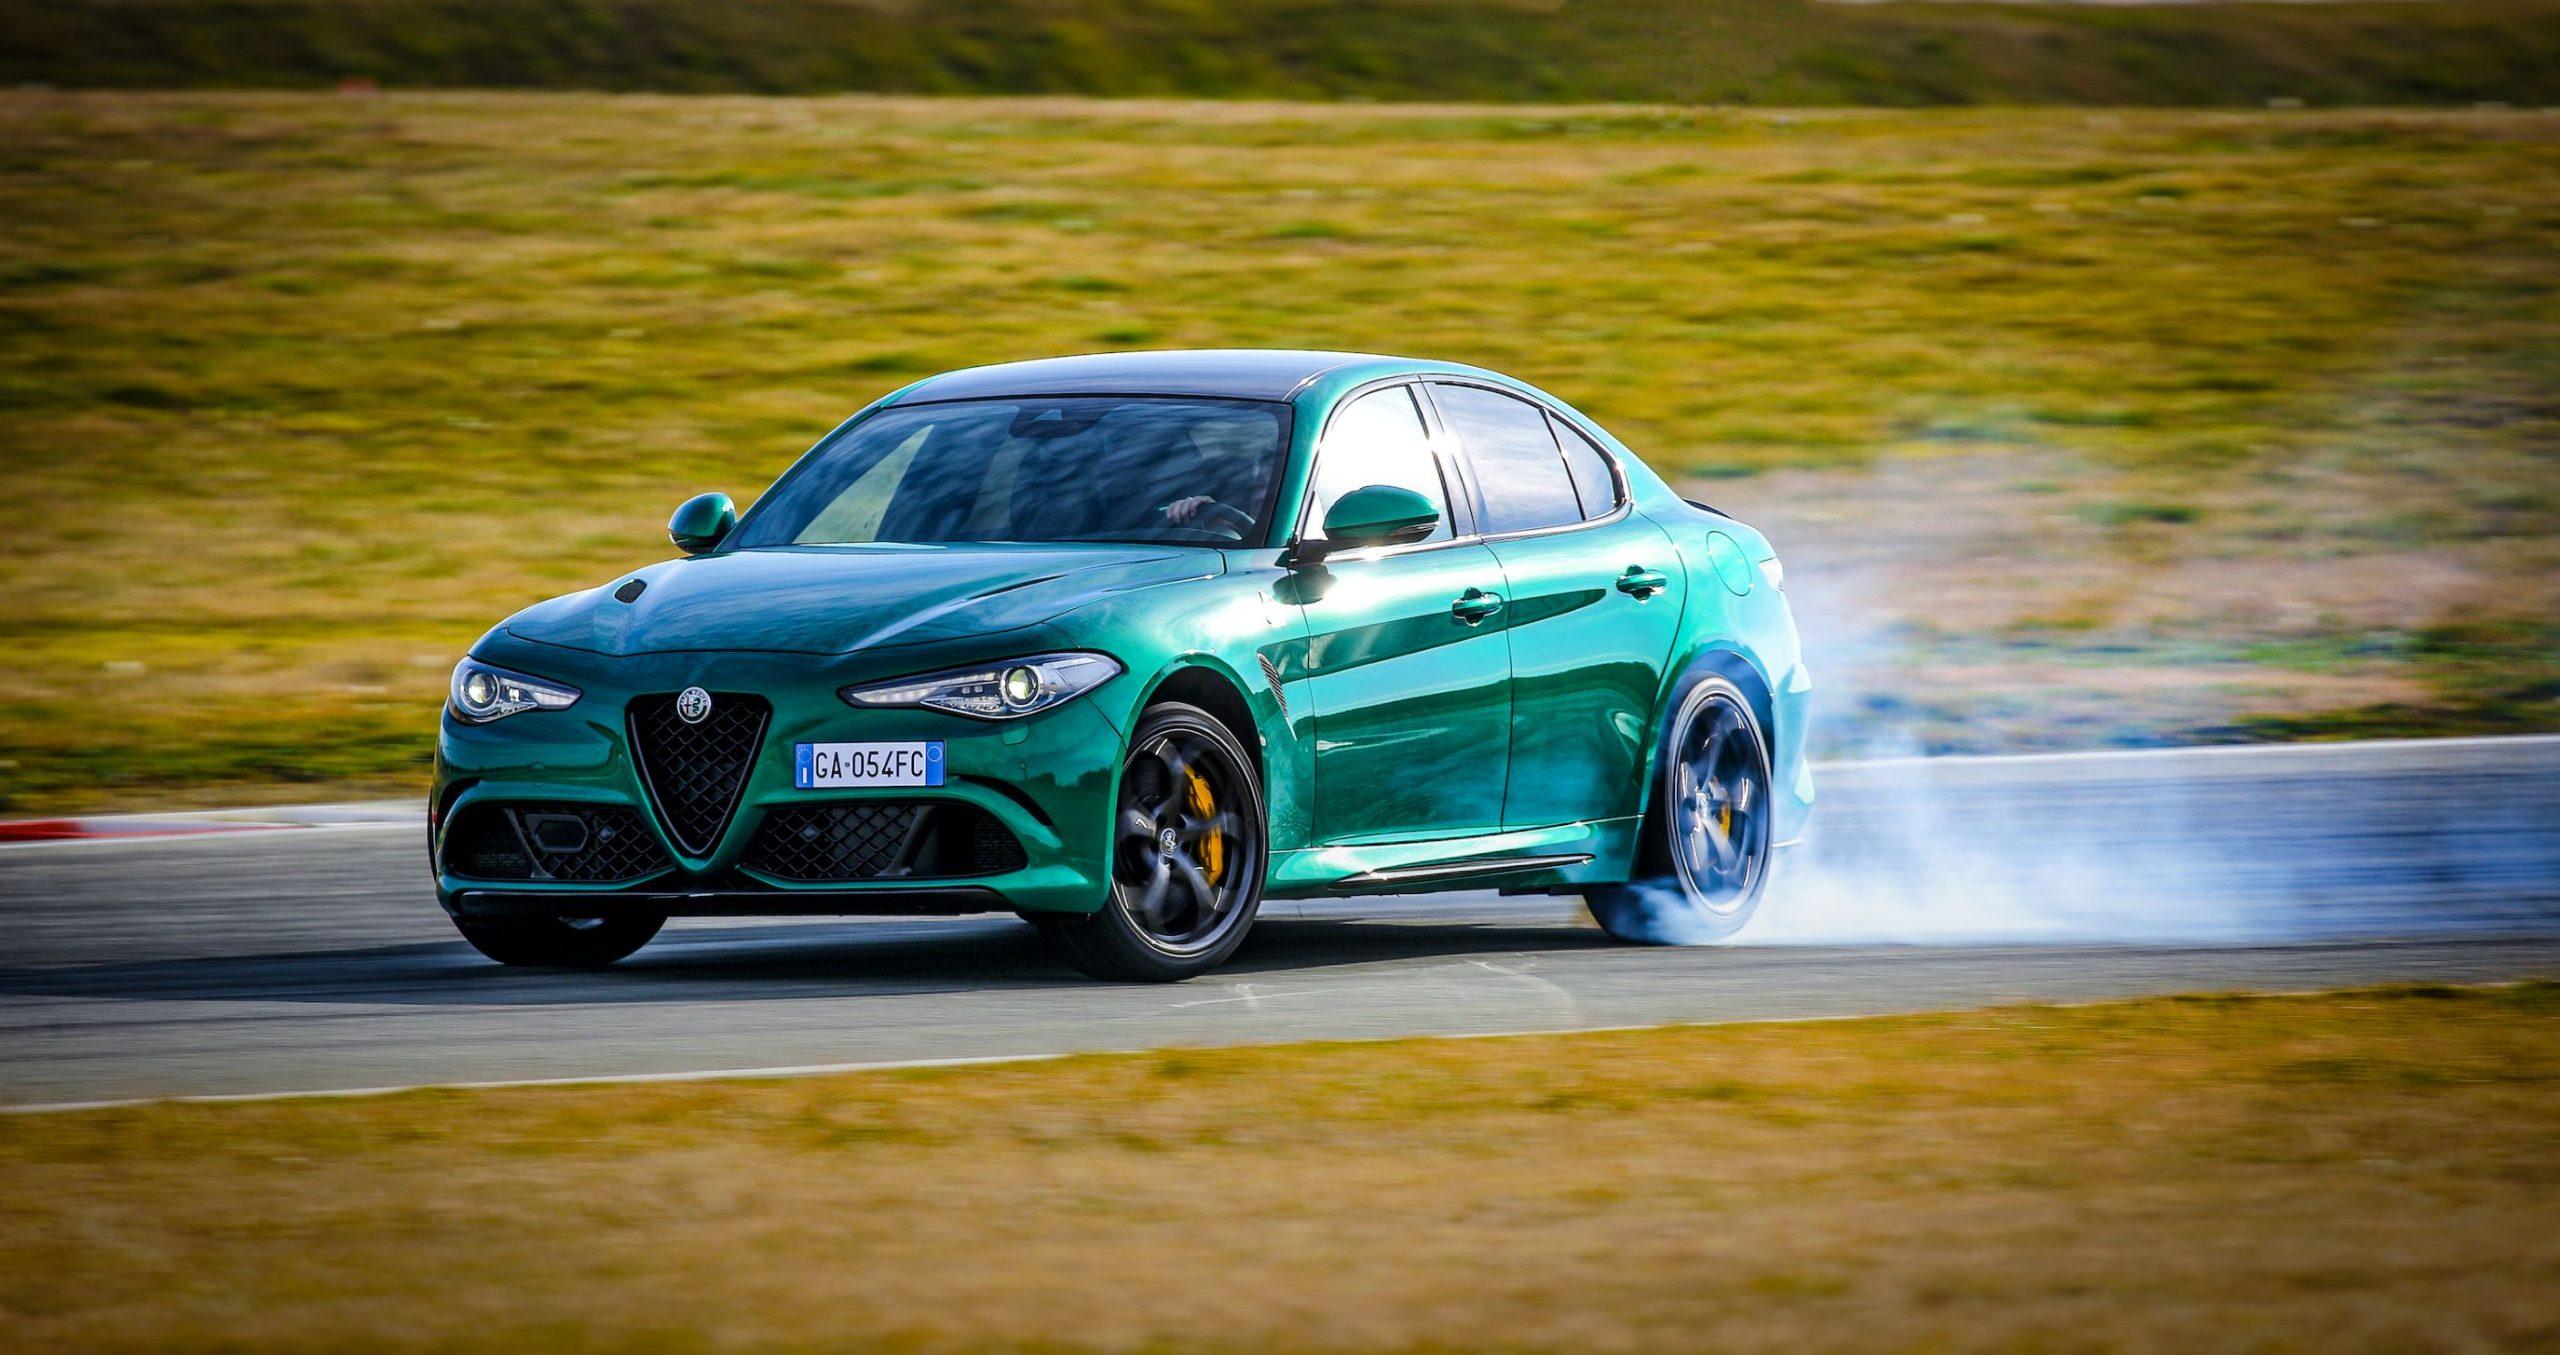 Alfa Romeo Giulia sliding